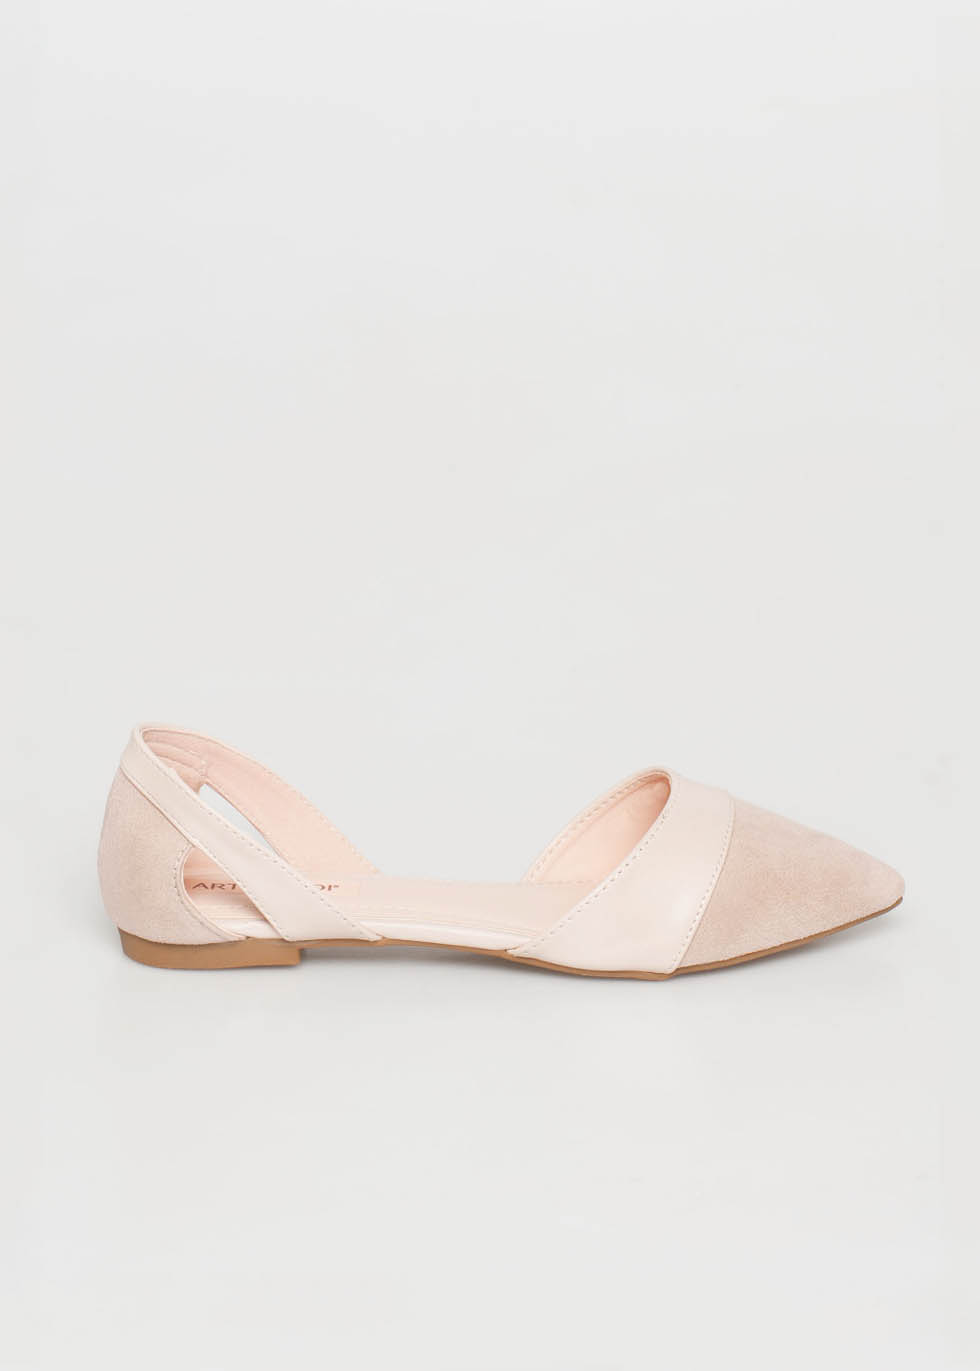 Alice pointed flat shoe, μπεζ γόβες